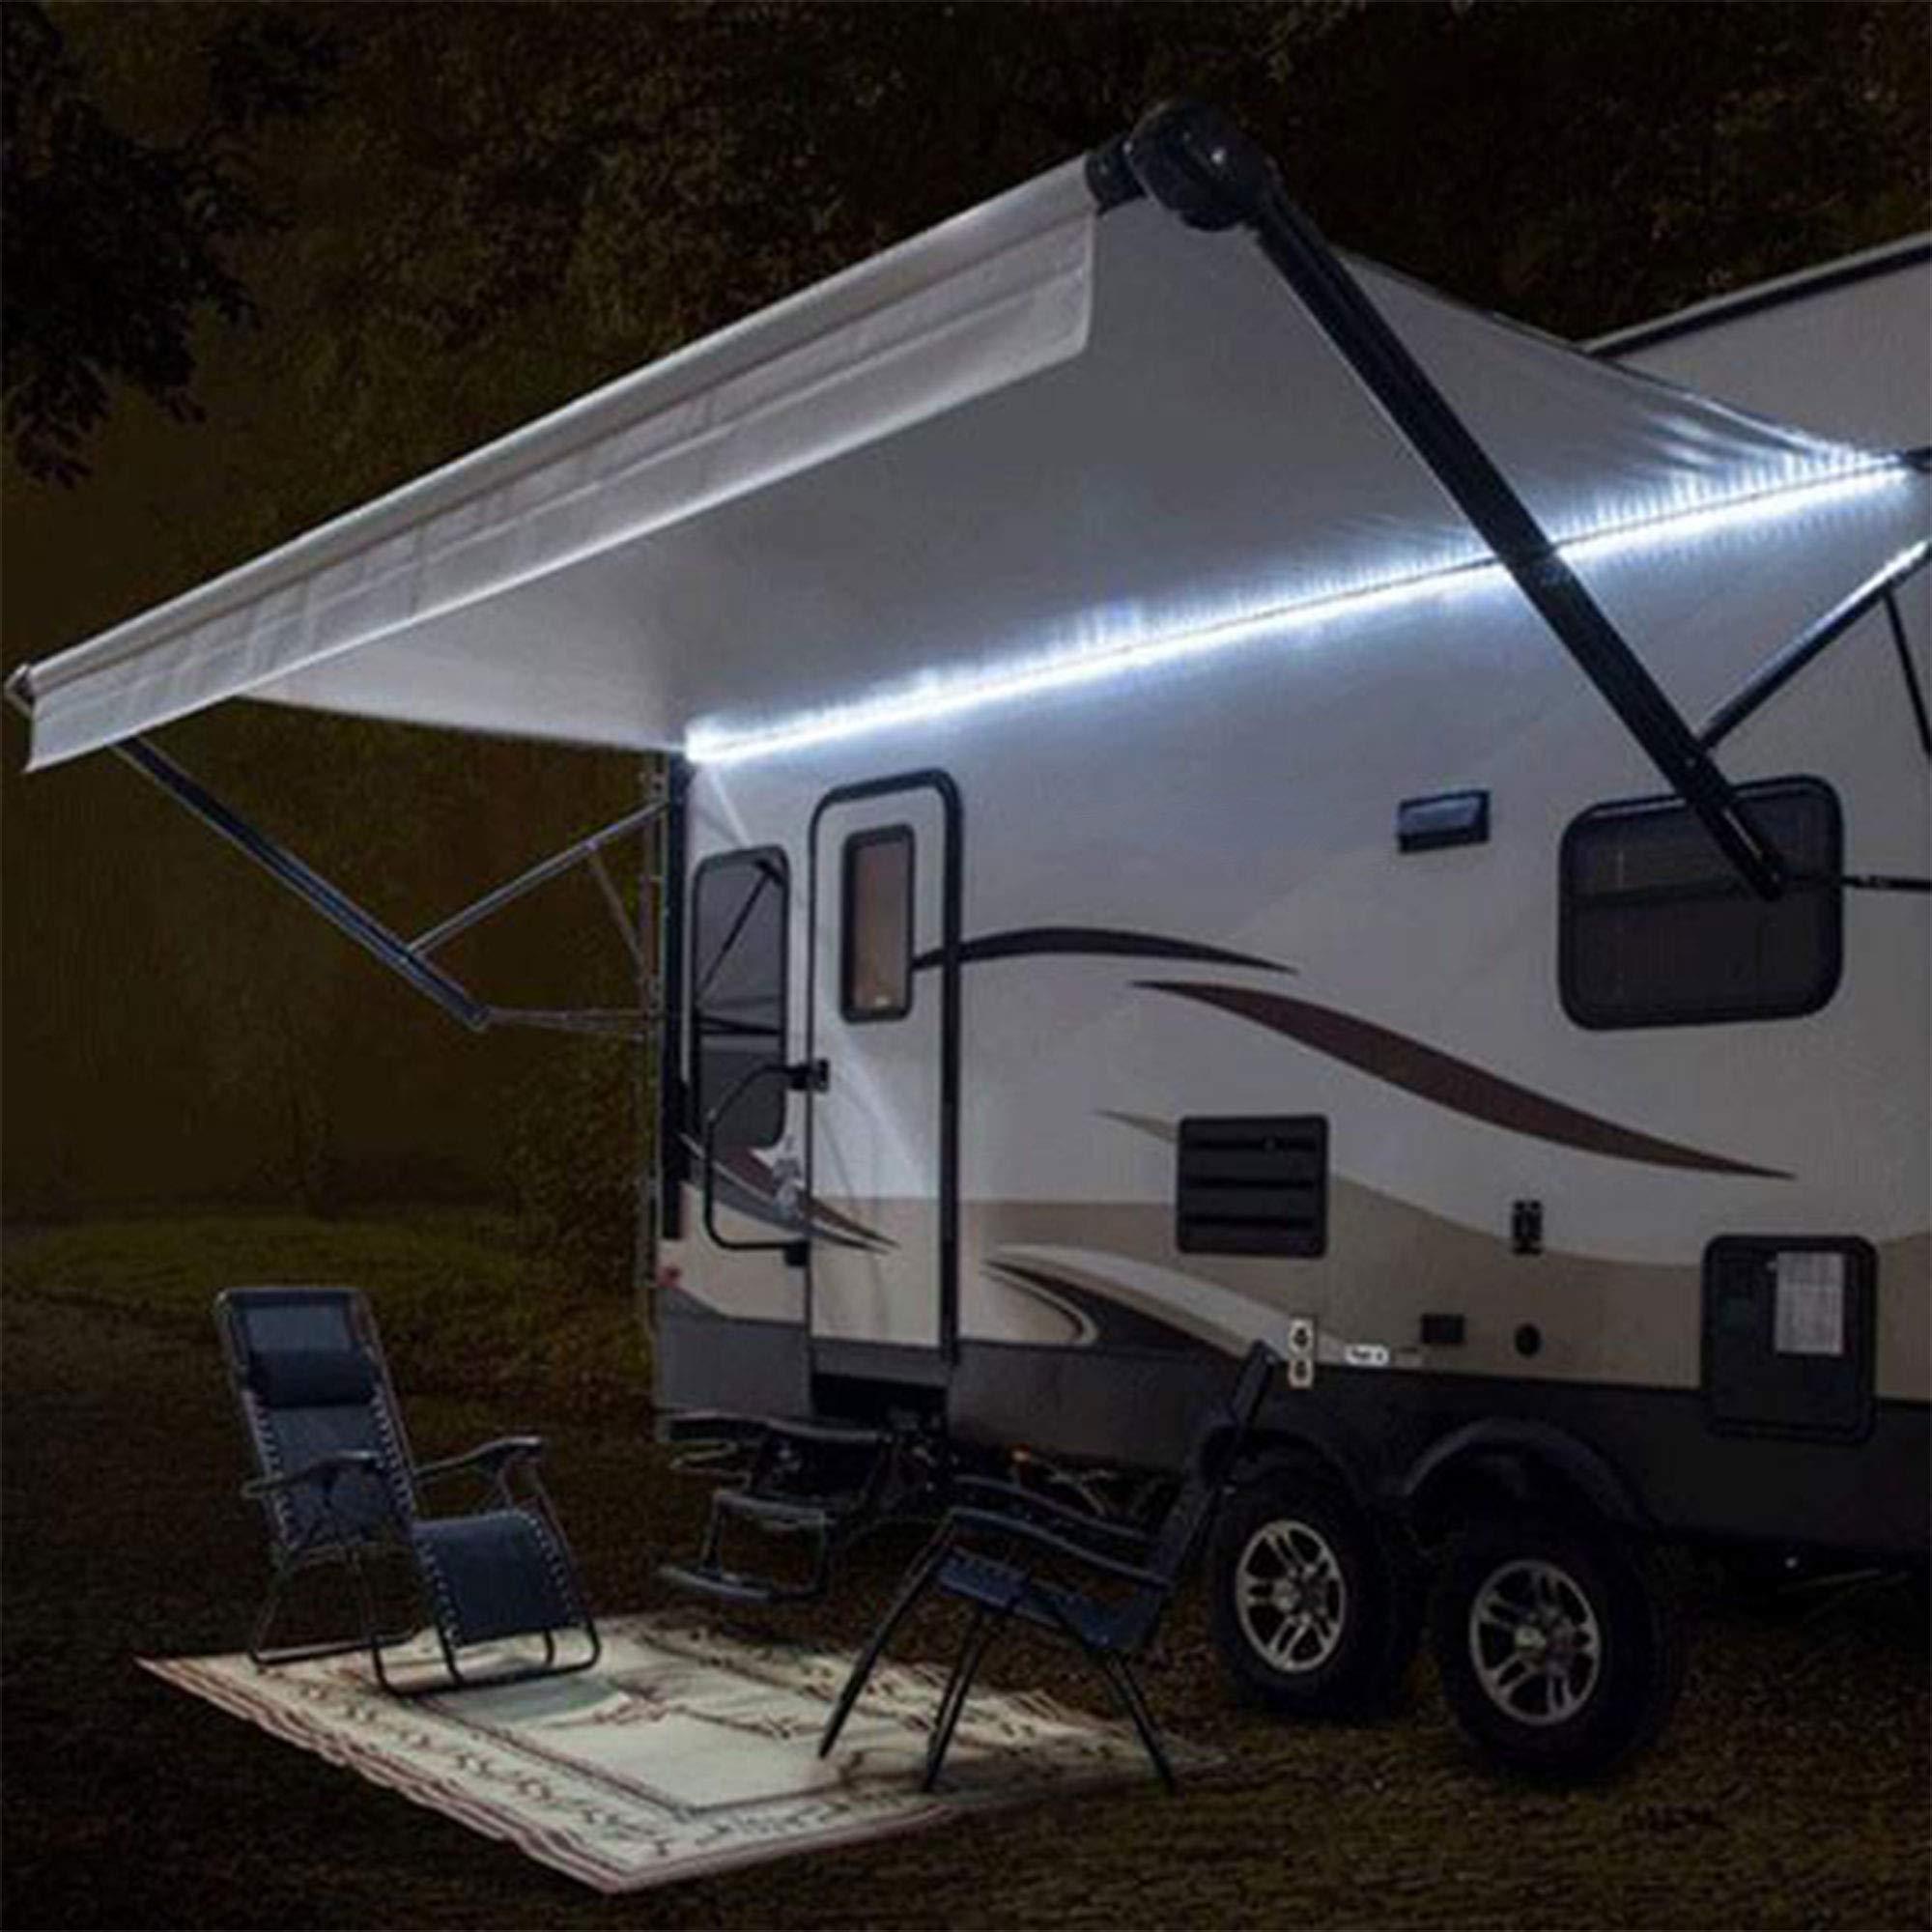 RecPro RV White LED Awning Party Light w/Mounting Channel & Black PCB 12v Light (16')